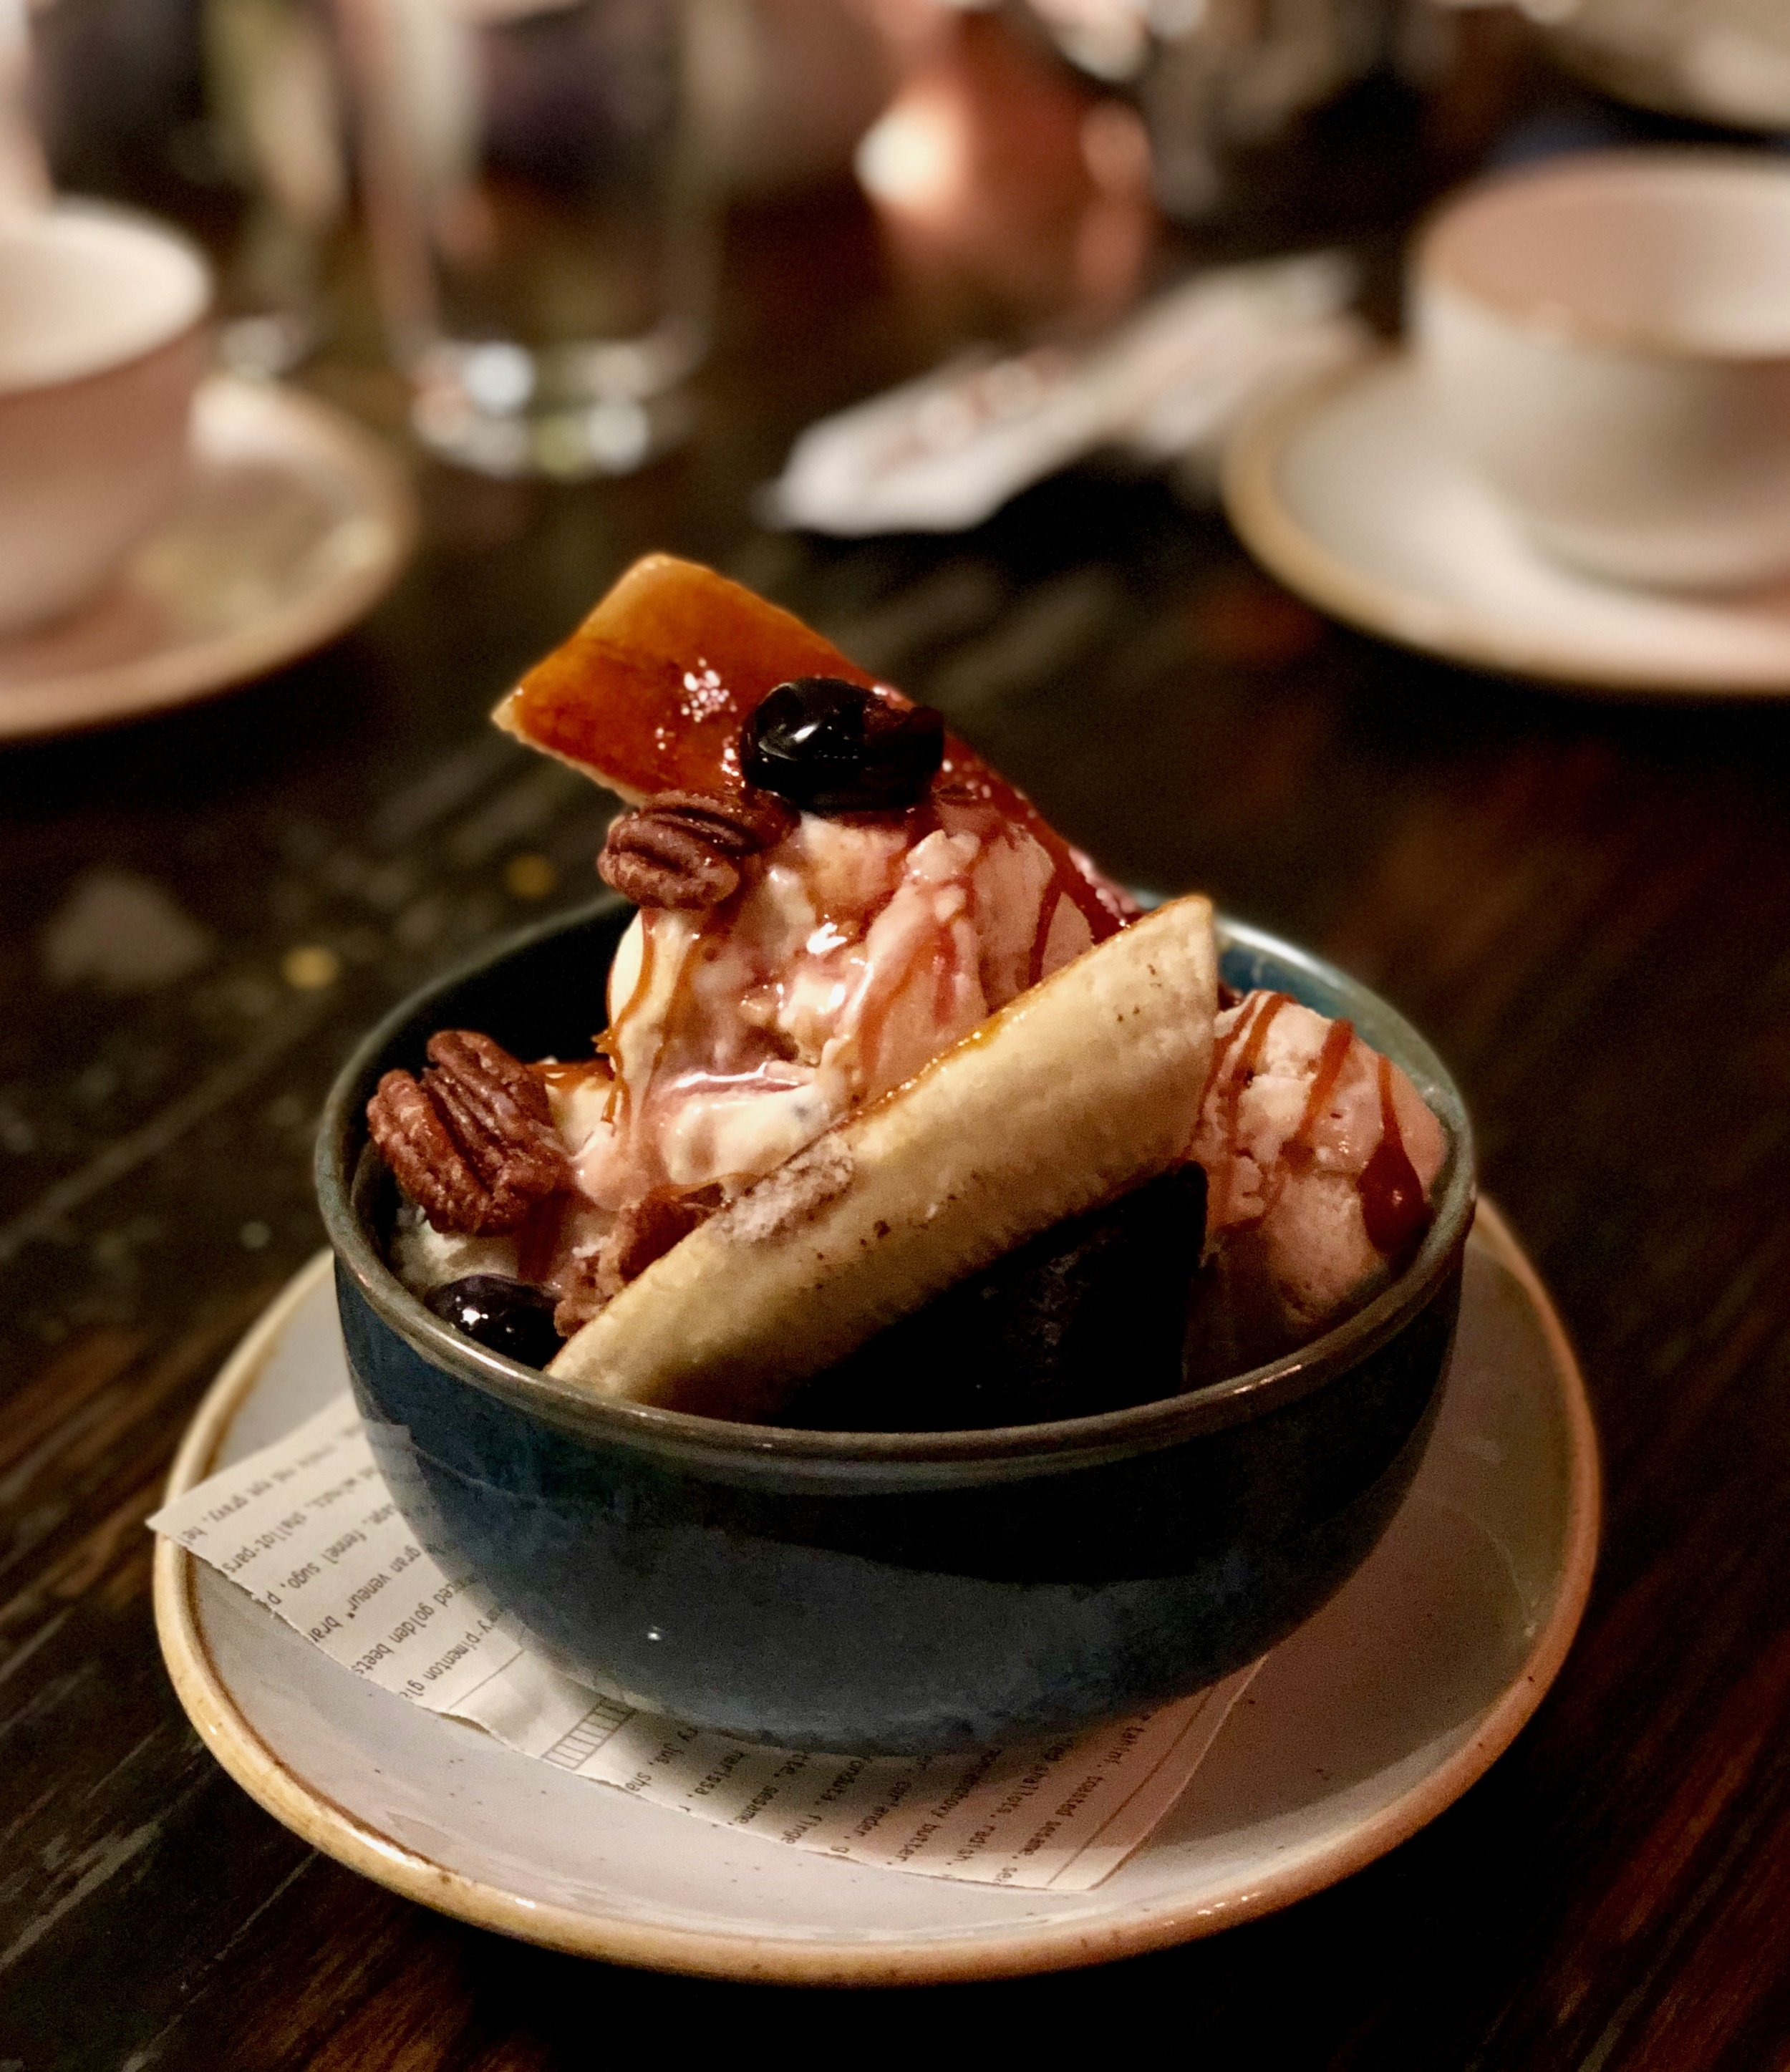 Brûléed Banana Split, tin roof ice cream with peanuts, chocolate brownie, candied pecans, caramel sau